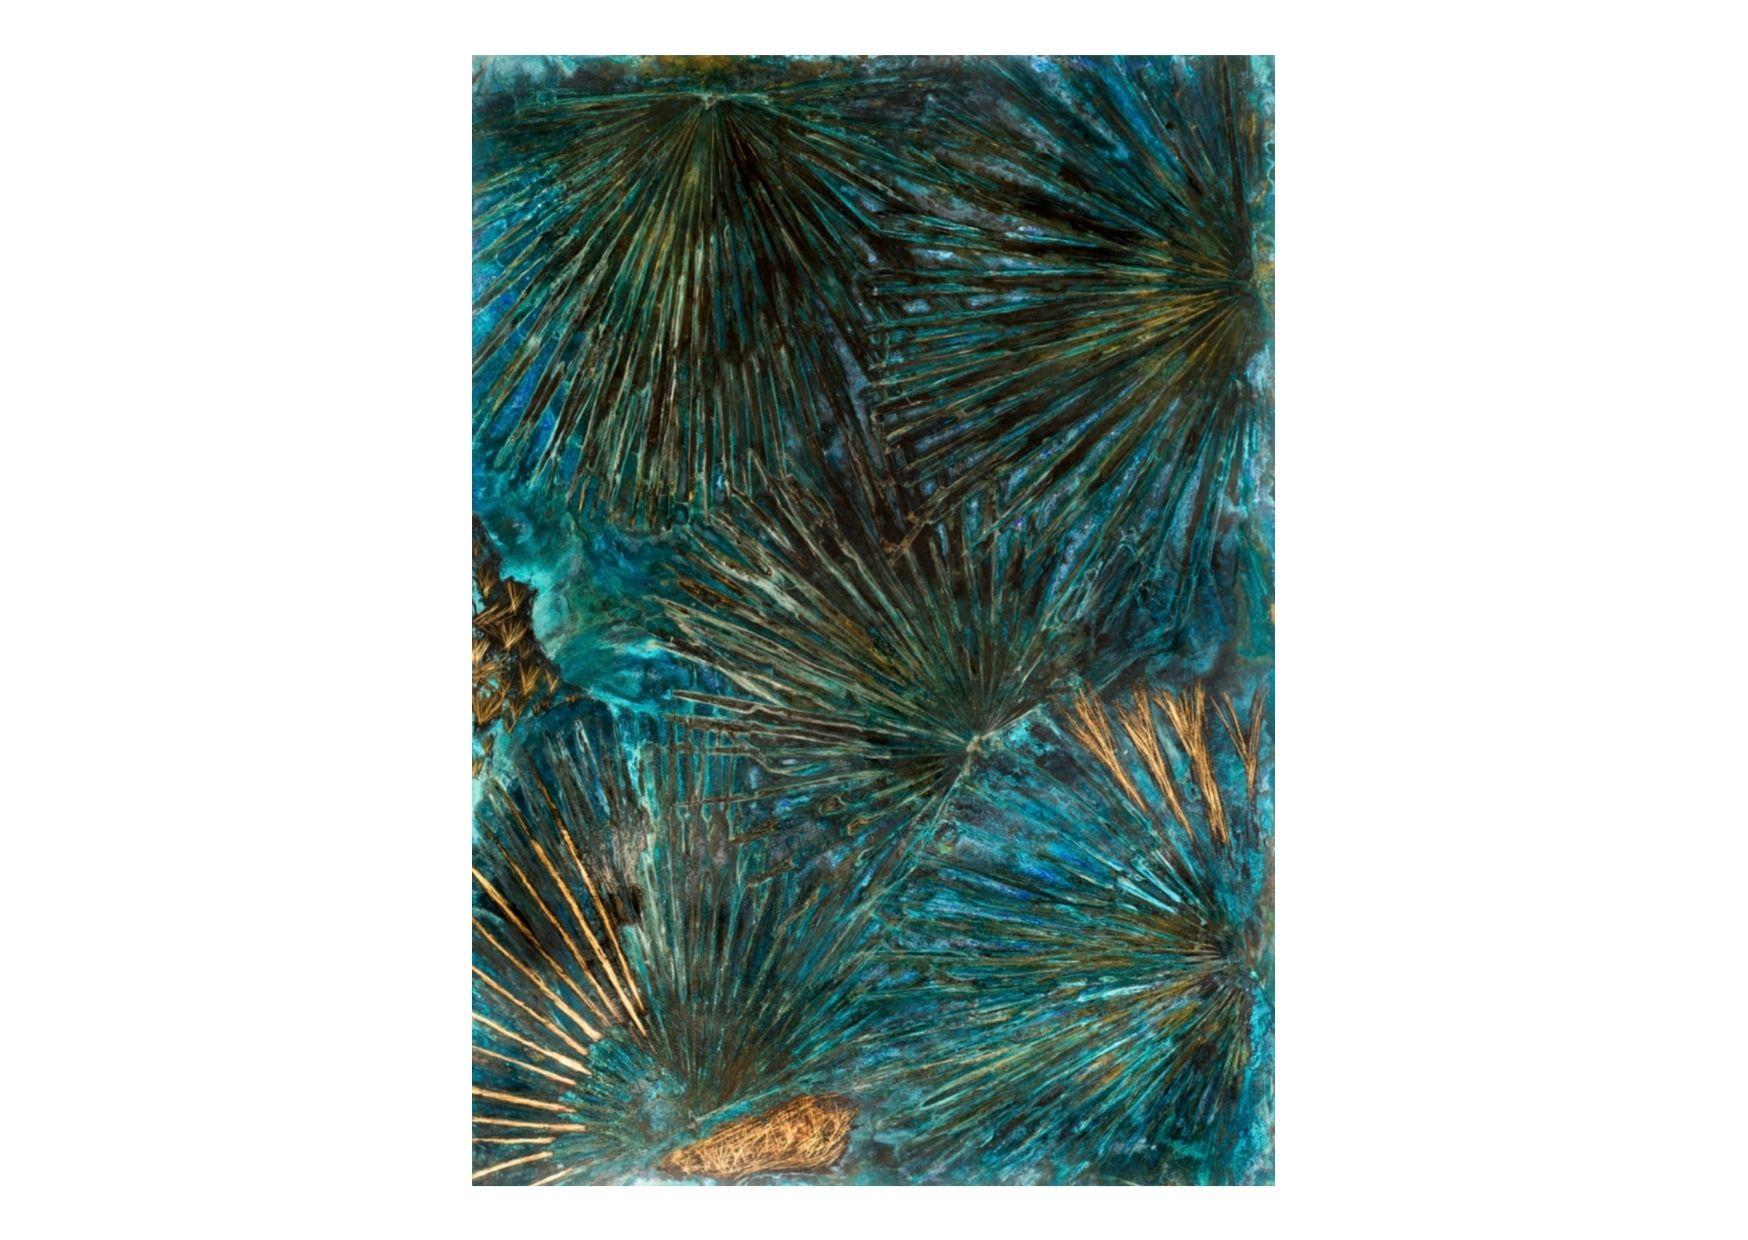 """Brahea Edulis"" 2018, ottone ossidato, 100 x 140 cm"